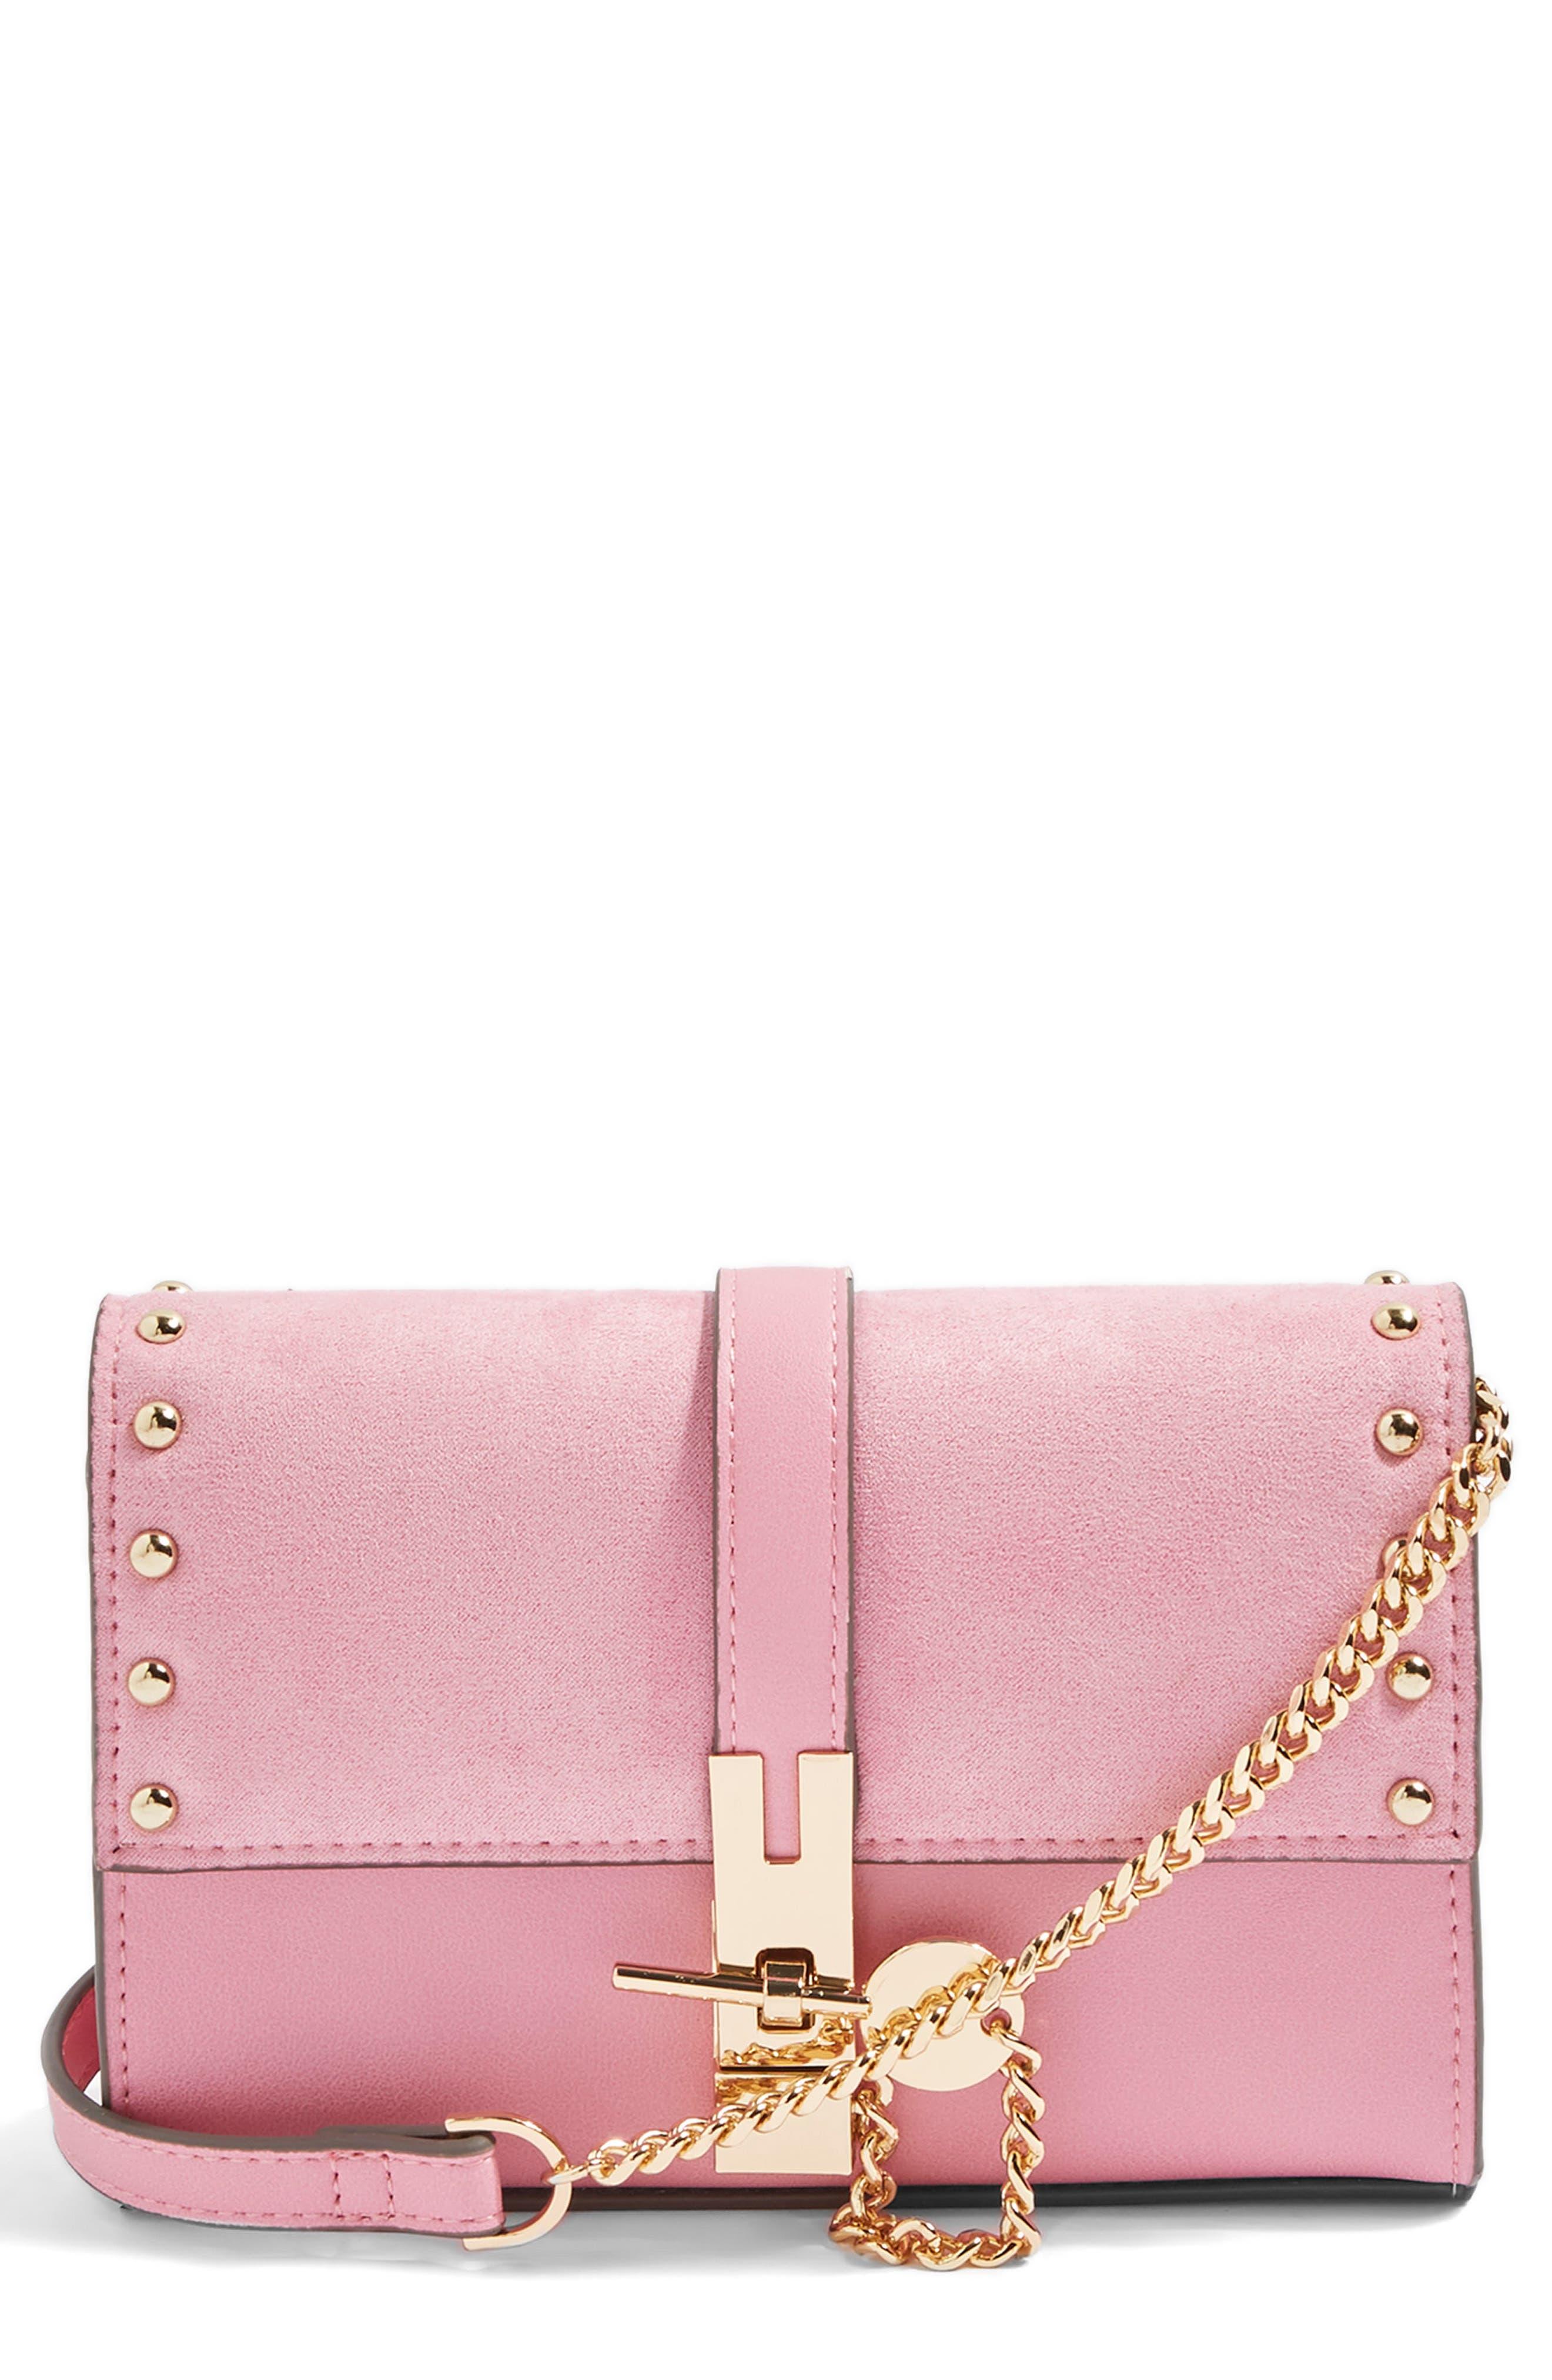 Topshop Rhonda Keylock Crossbody Bag